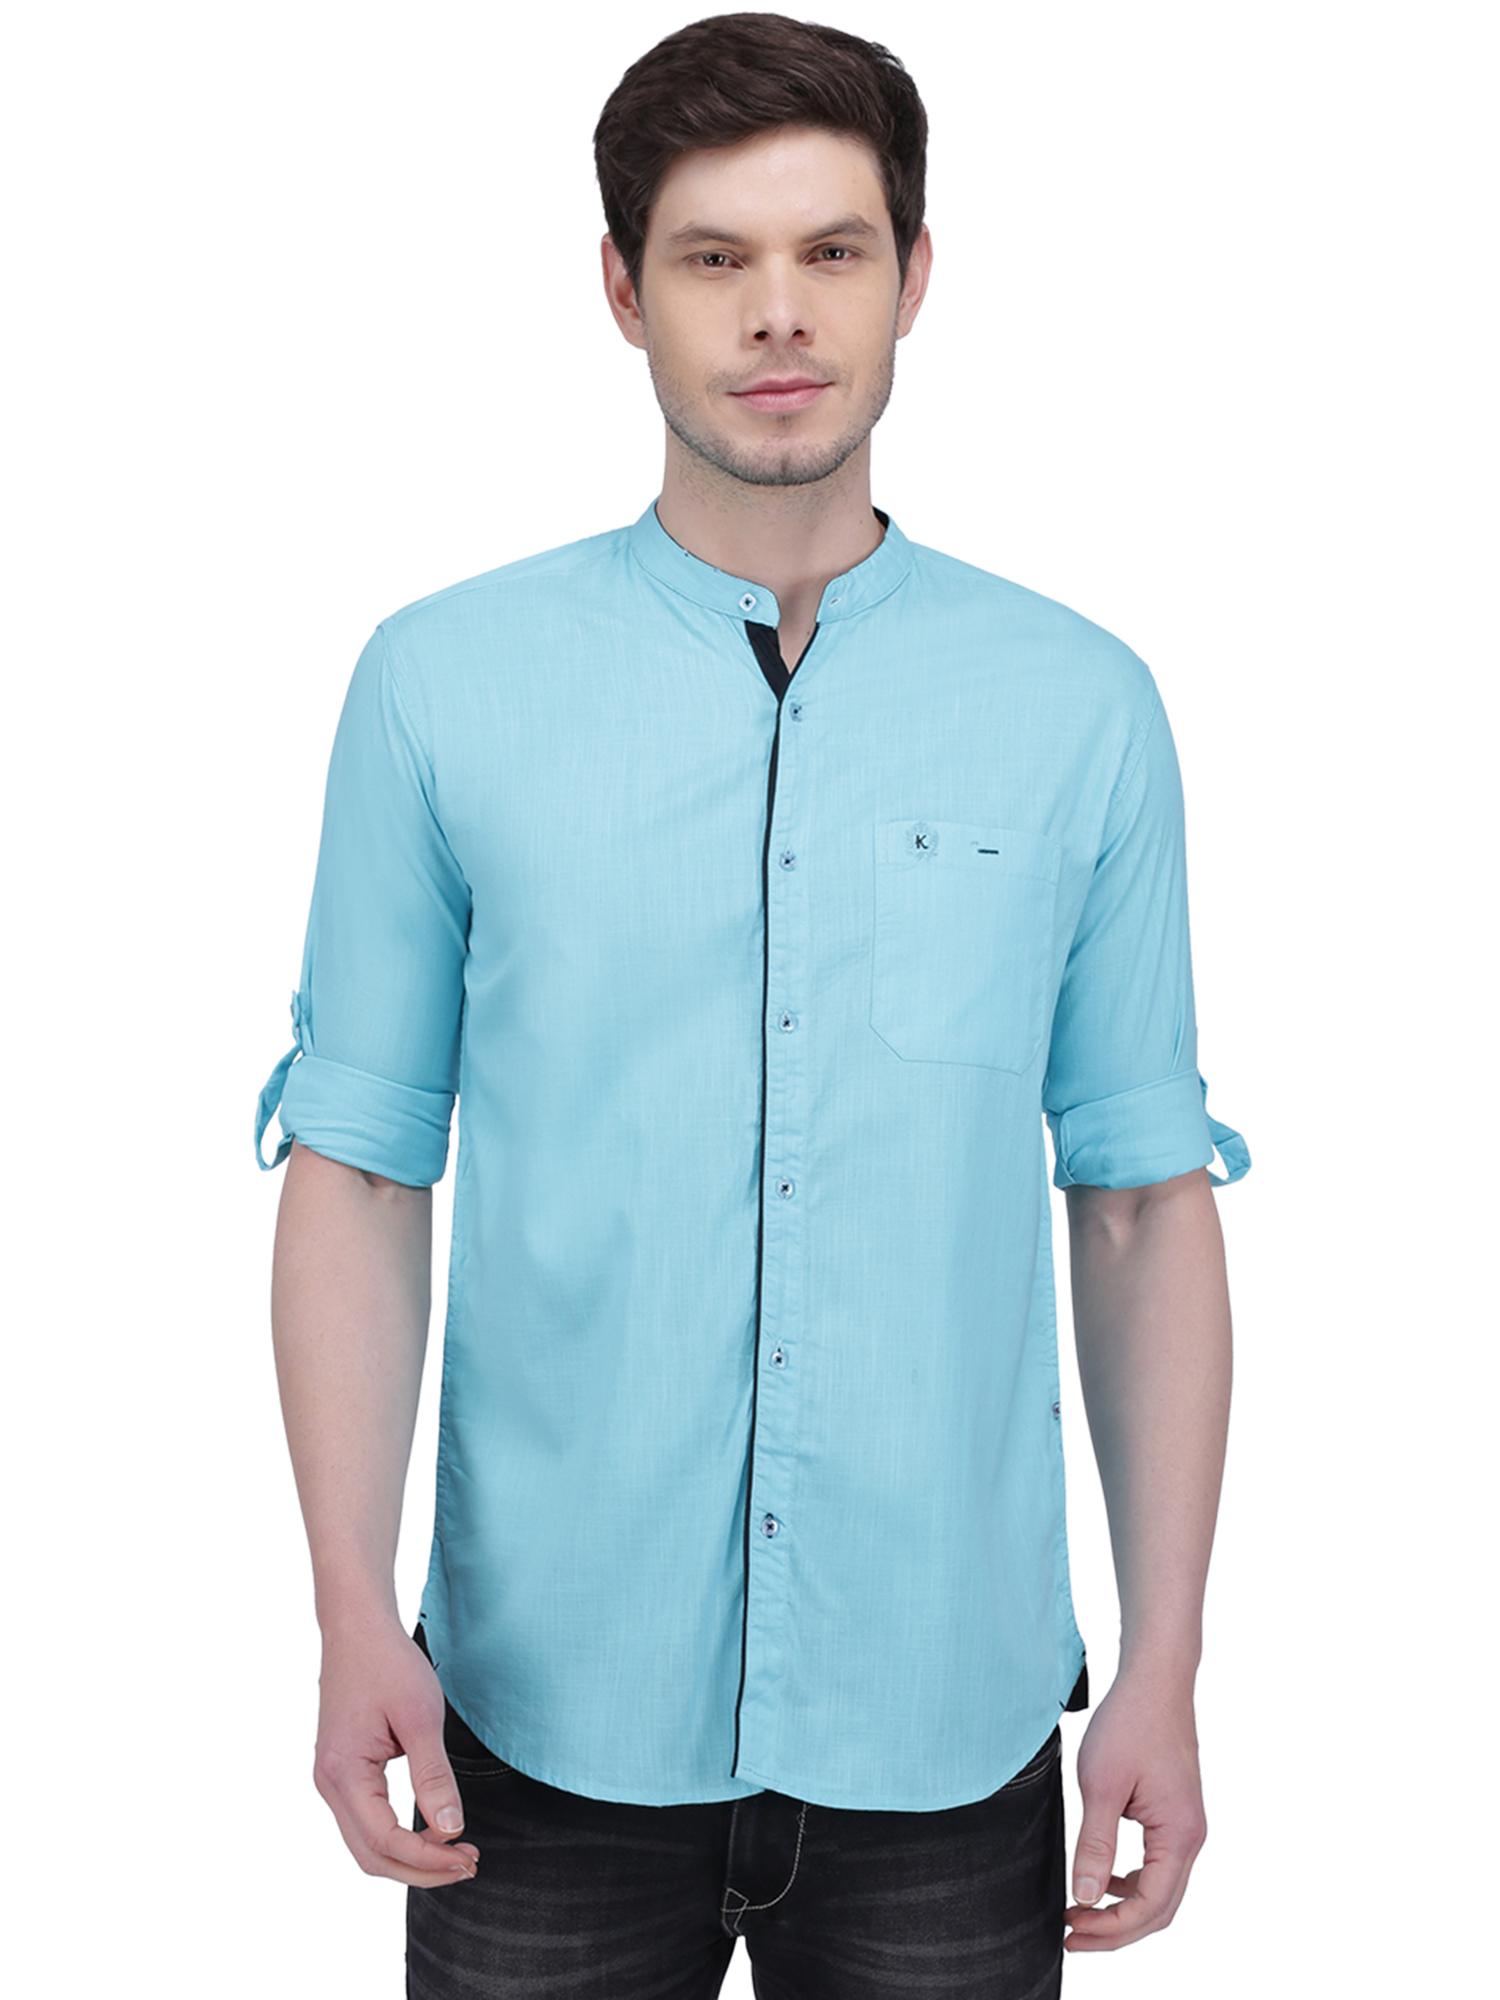 Kuons Avenue | Kuons Avenue Men's Turquoise Linen Cotton Casual Shirt- KACLFS1291TQ